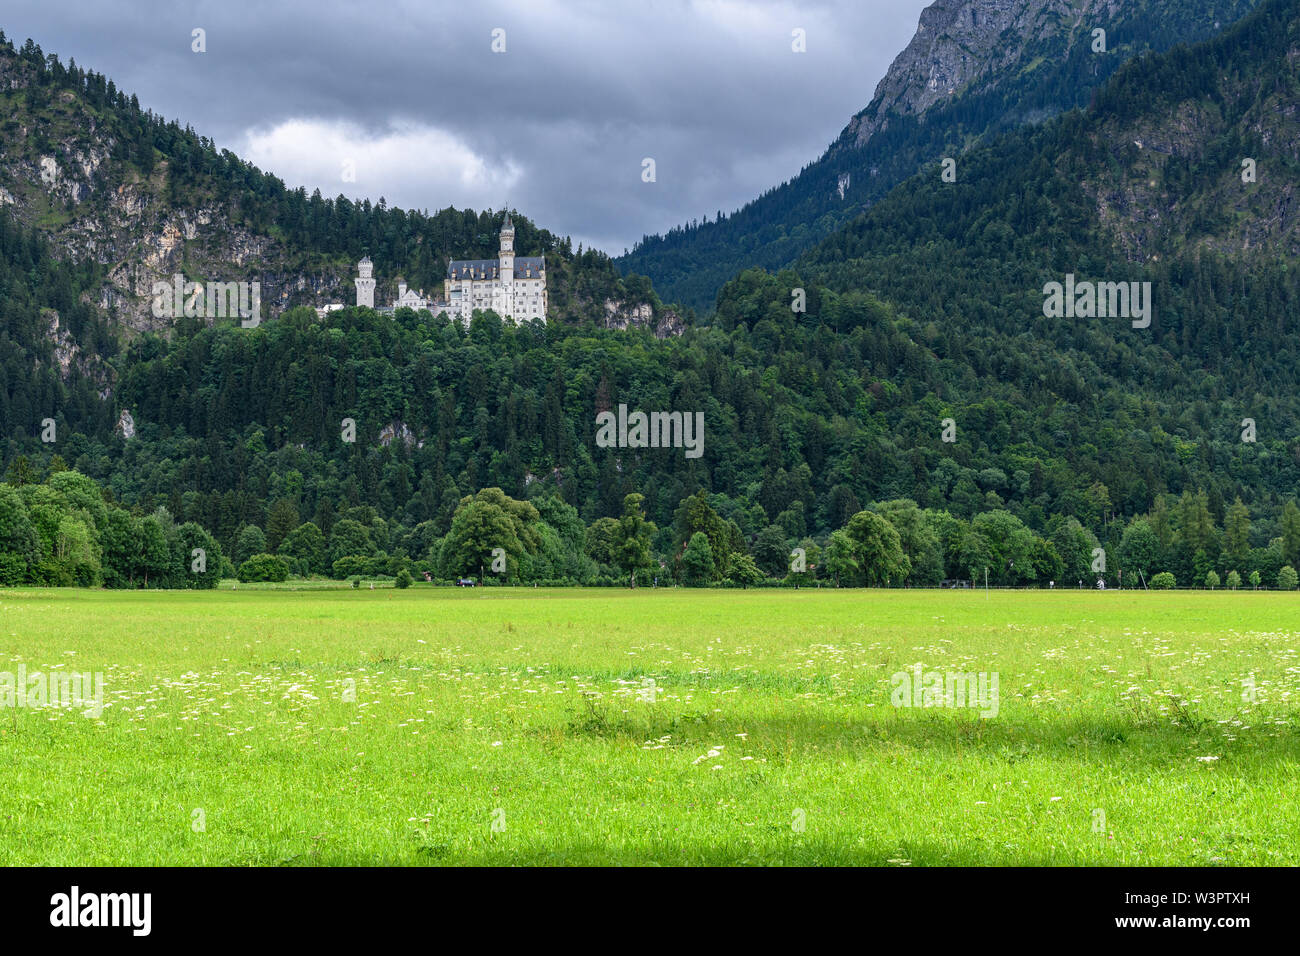 HOHENSCHWANGAU, BAVARIA, GERMANY - JUL 2017: Royal Neuschwanstein castle is a picturesque corner of the Bavarian Alps. - Stock Image